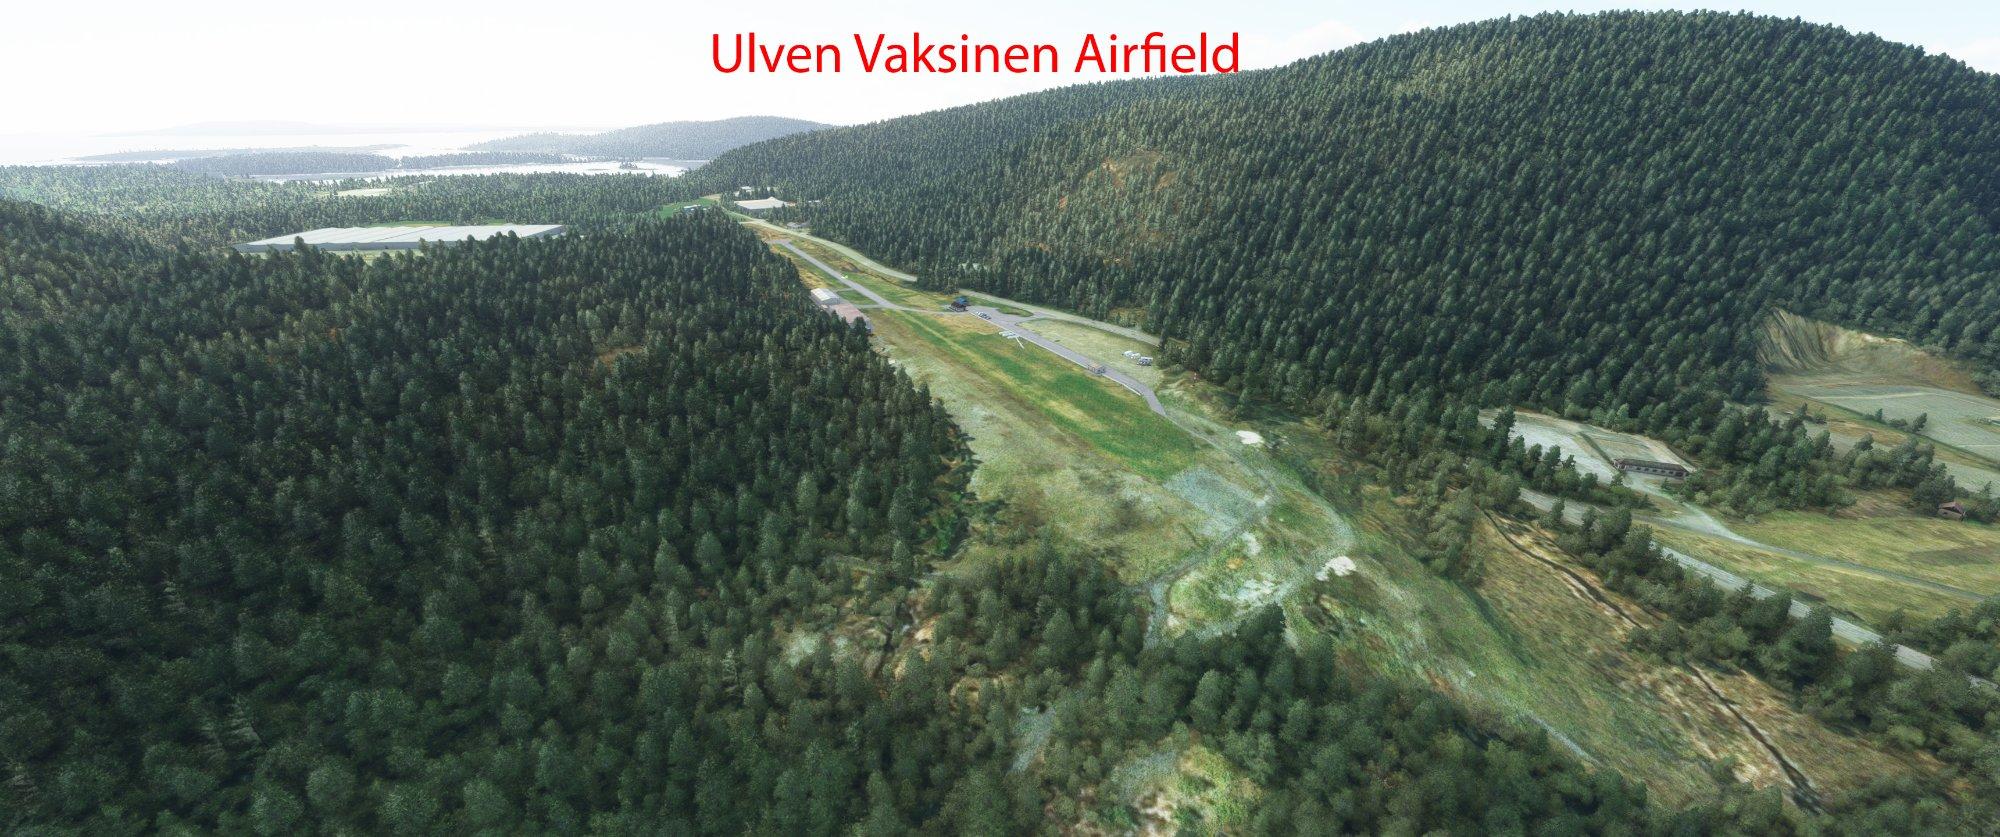 ulven_vaksinen airfield_1.jpg